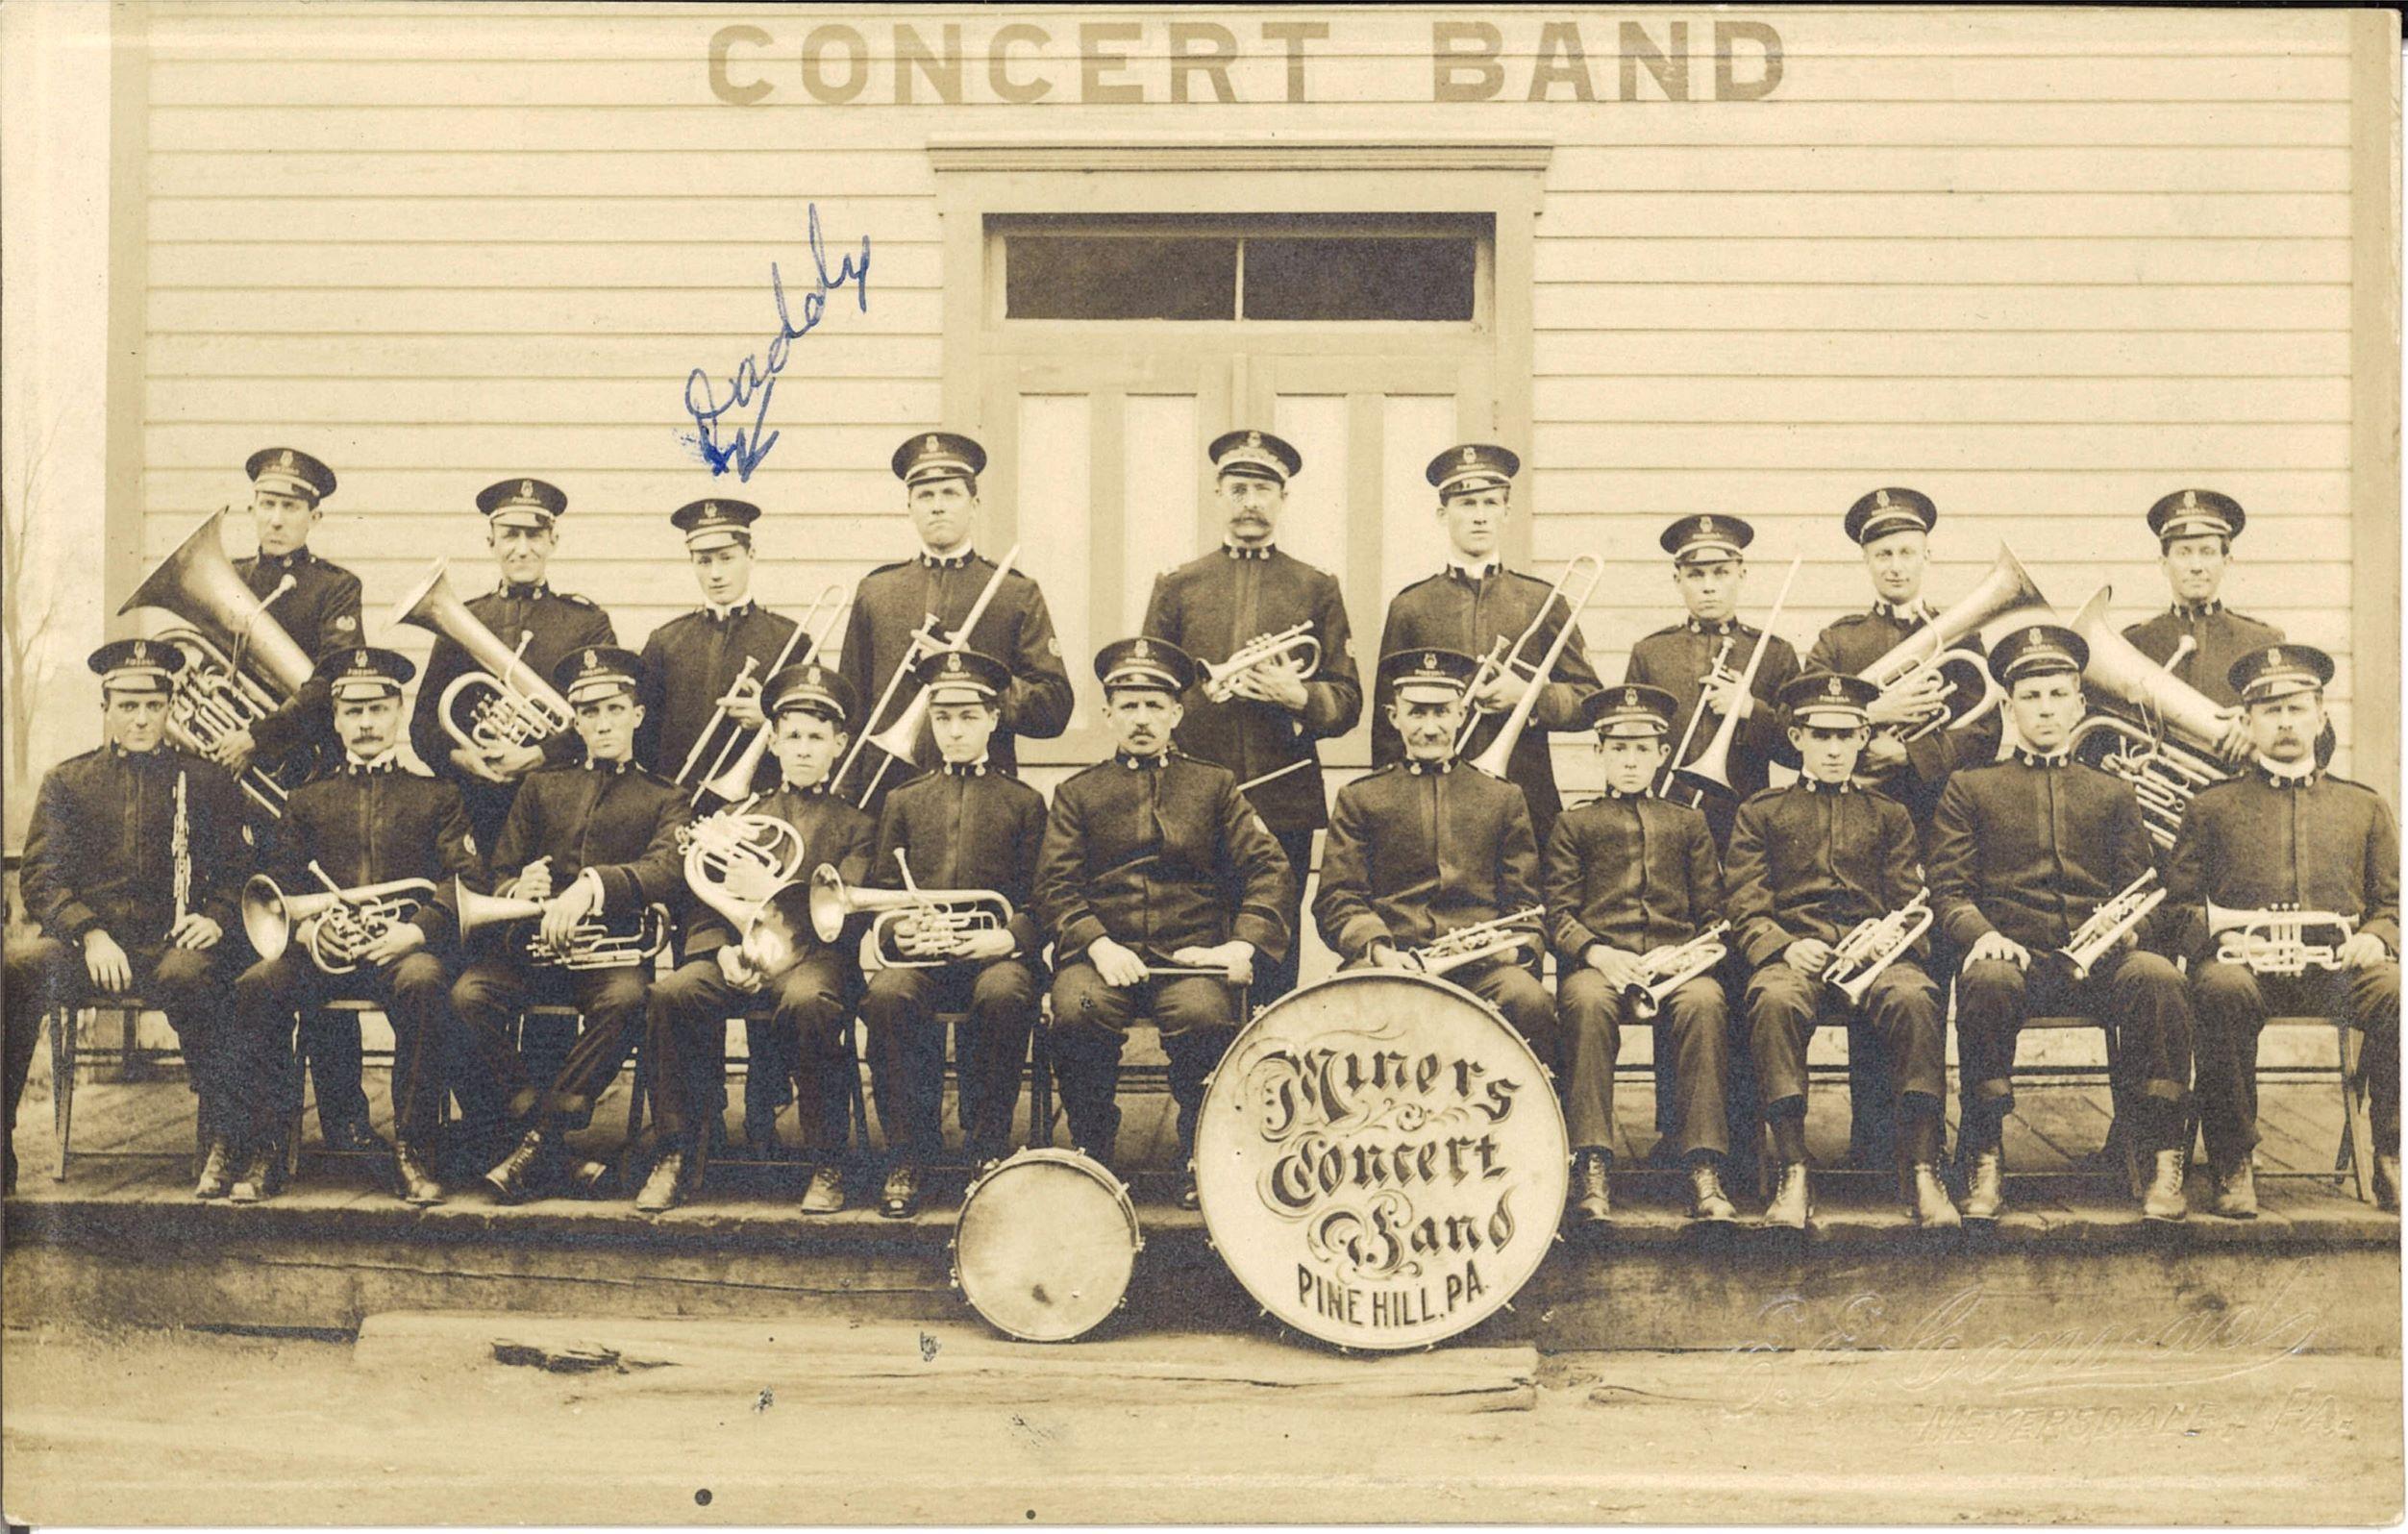 Miner's Concert Band